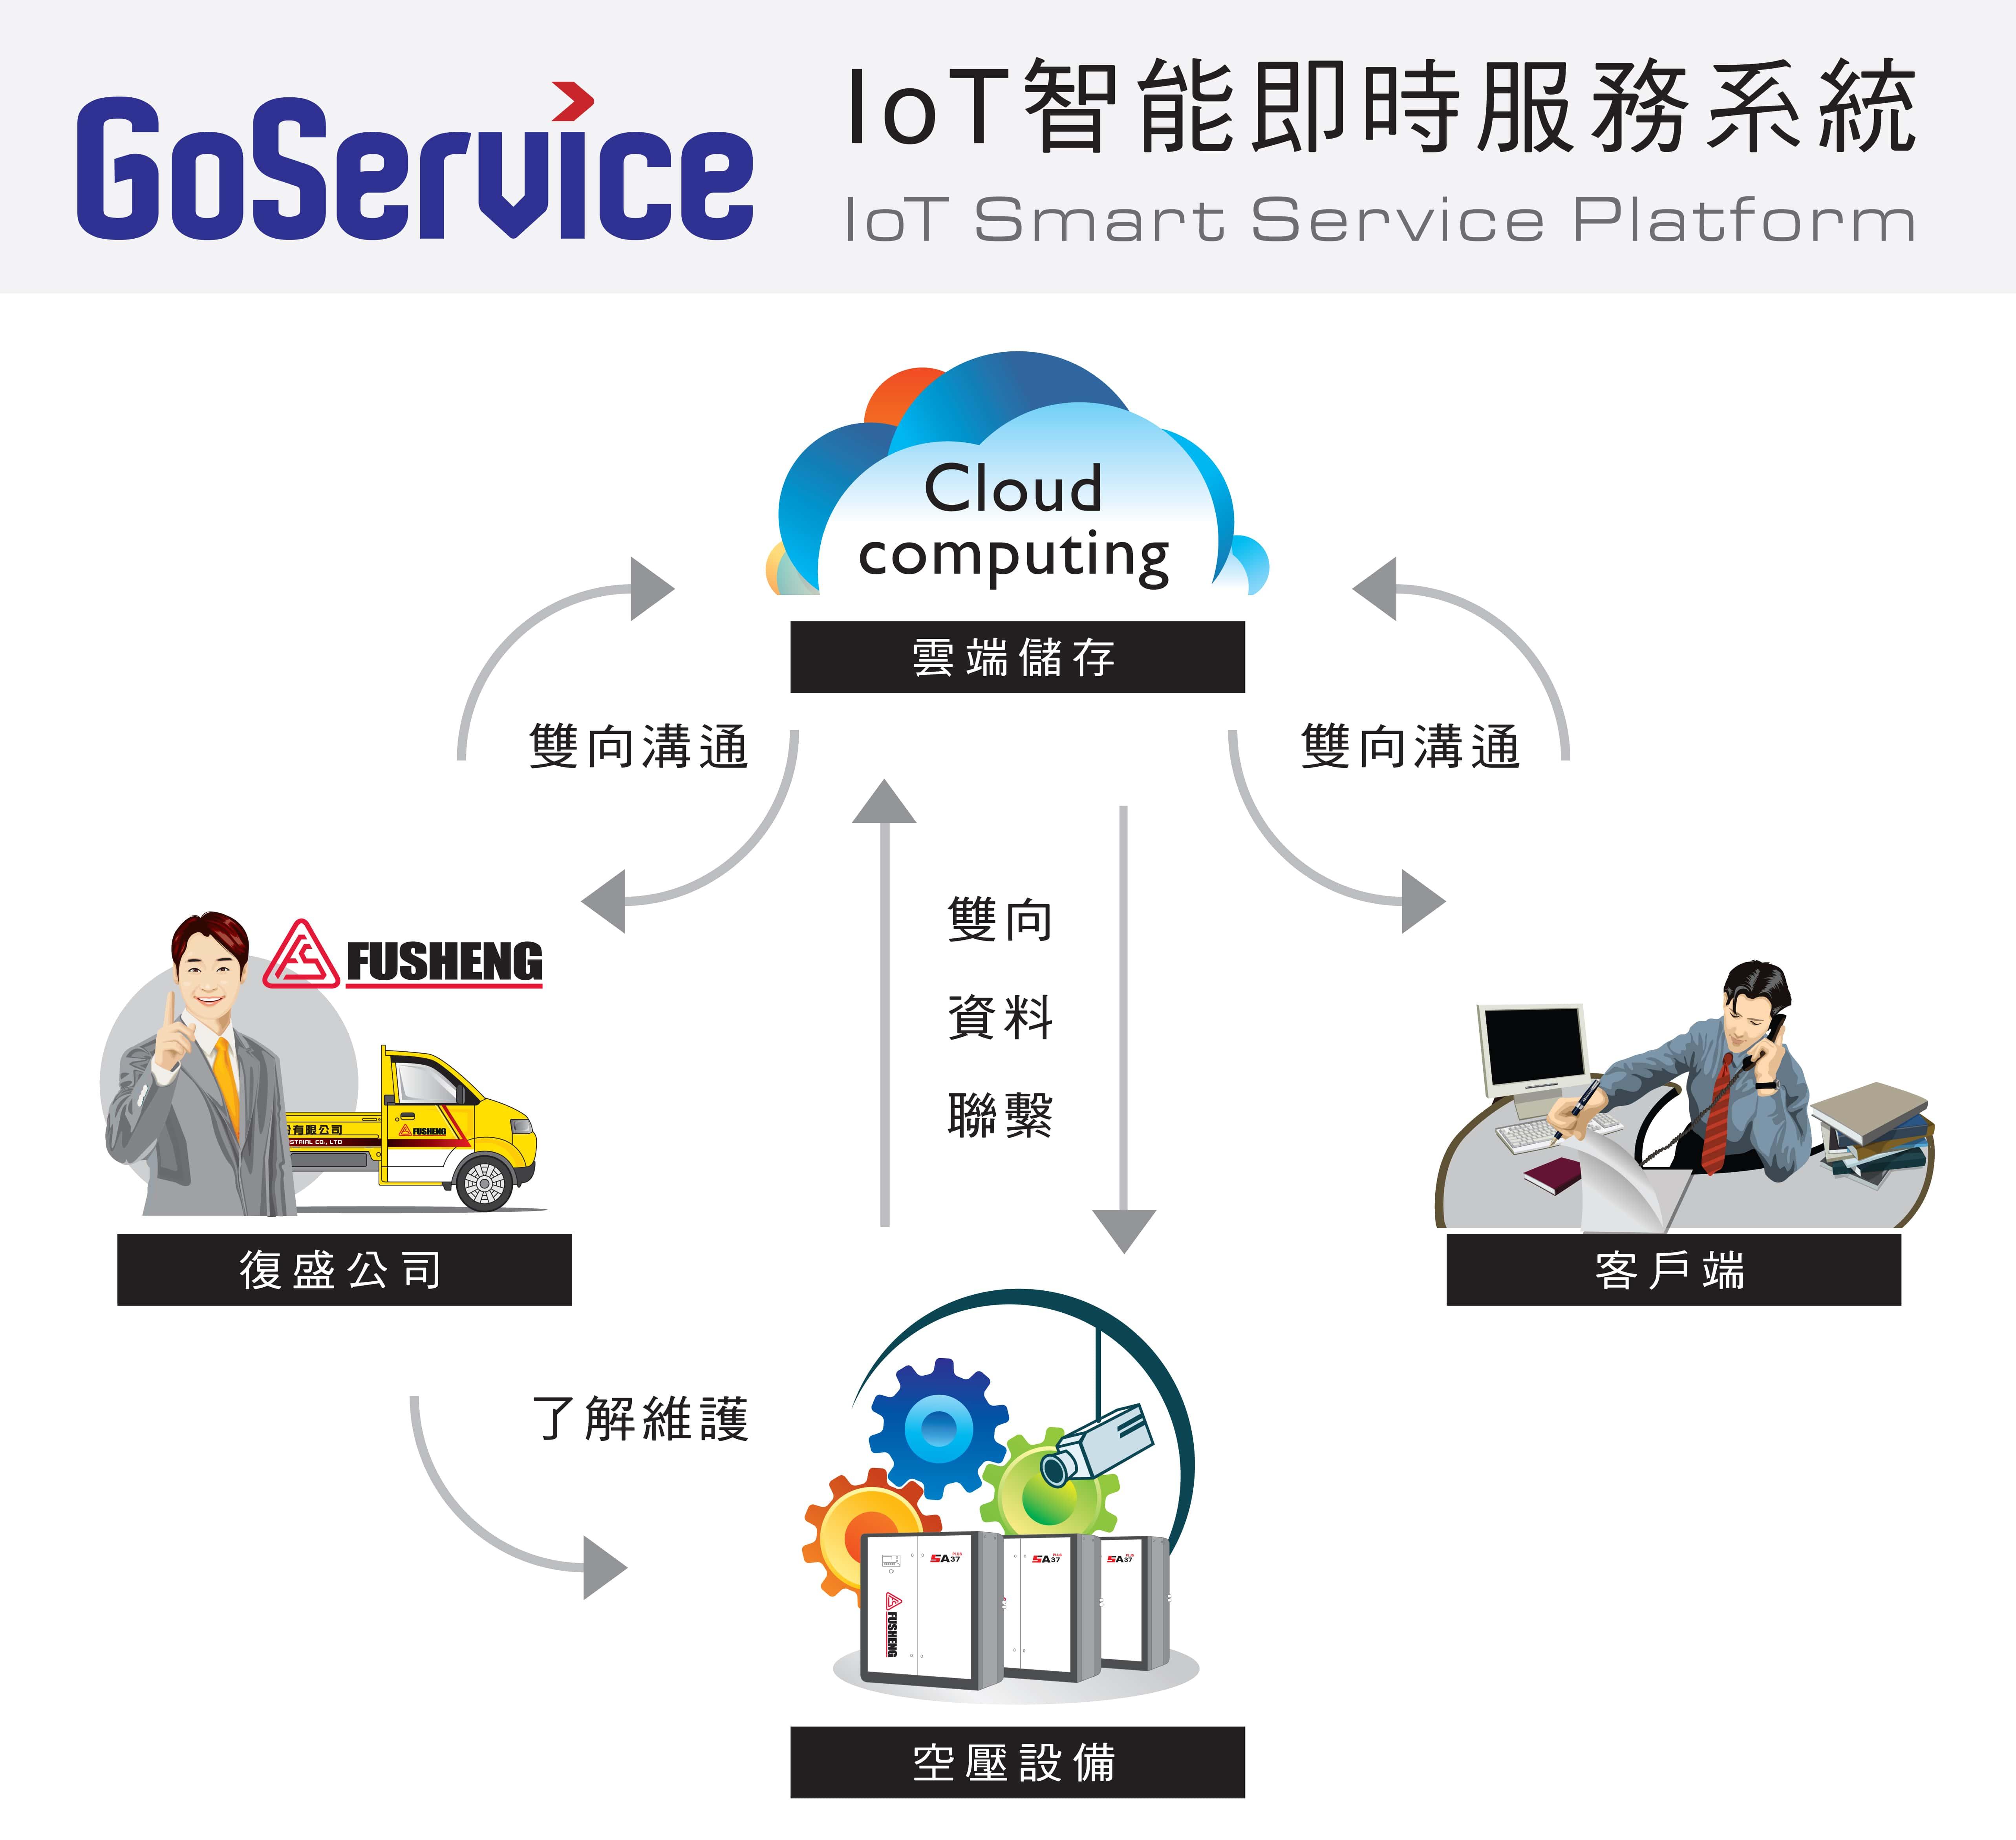 ind_images/CompanyNews/2015-2016/20160201_復盛_Go_Service_IoT_智能即時系統_強大.jpg